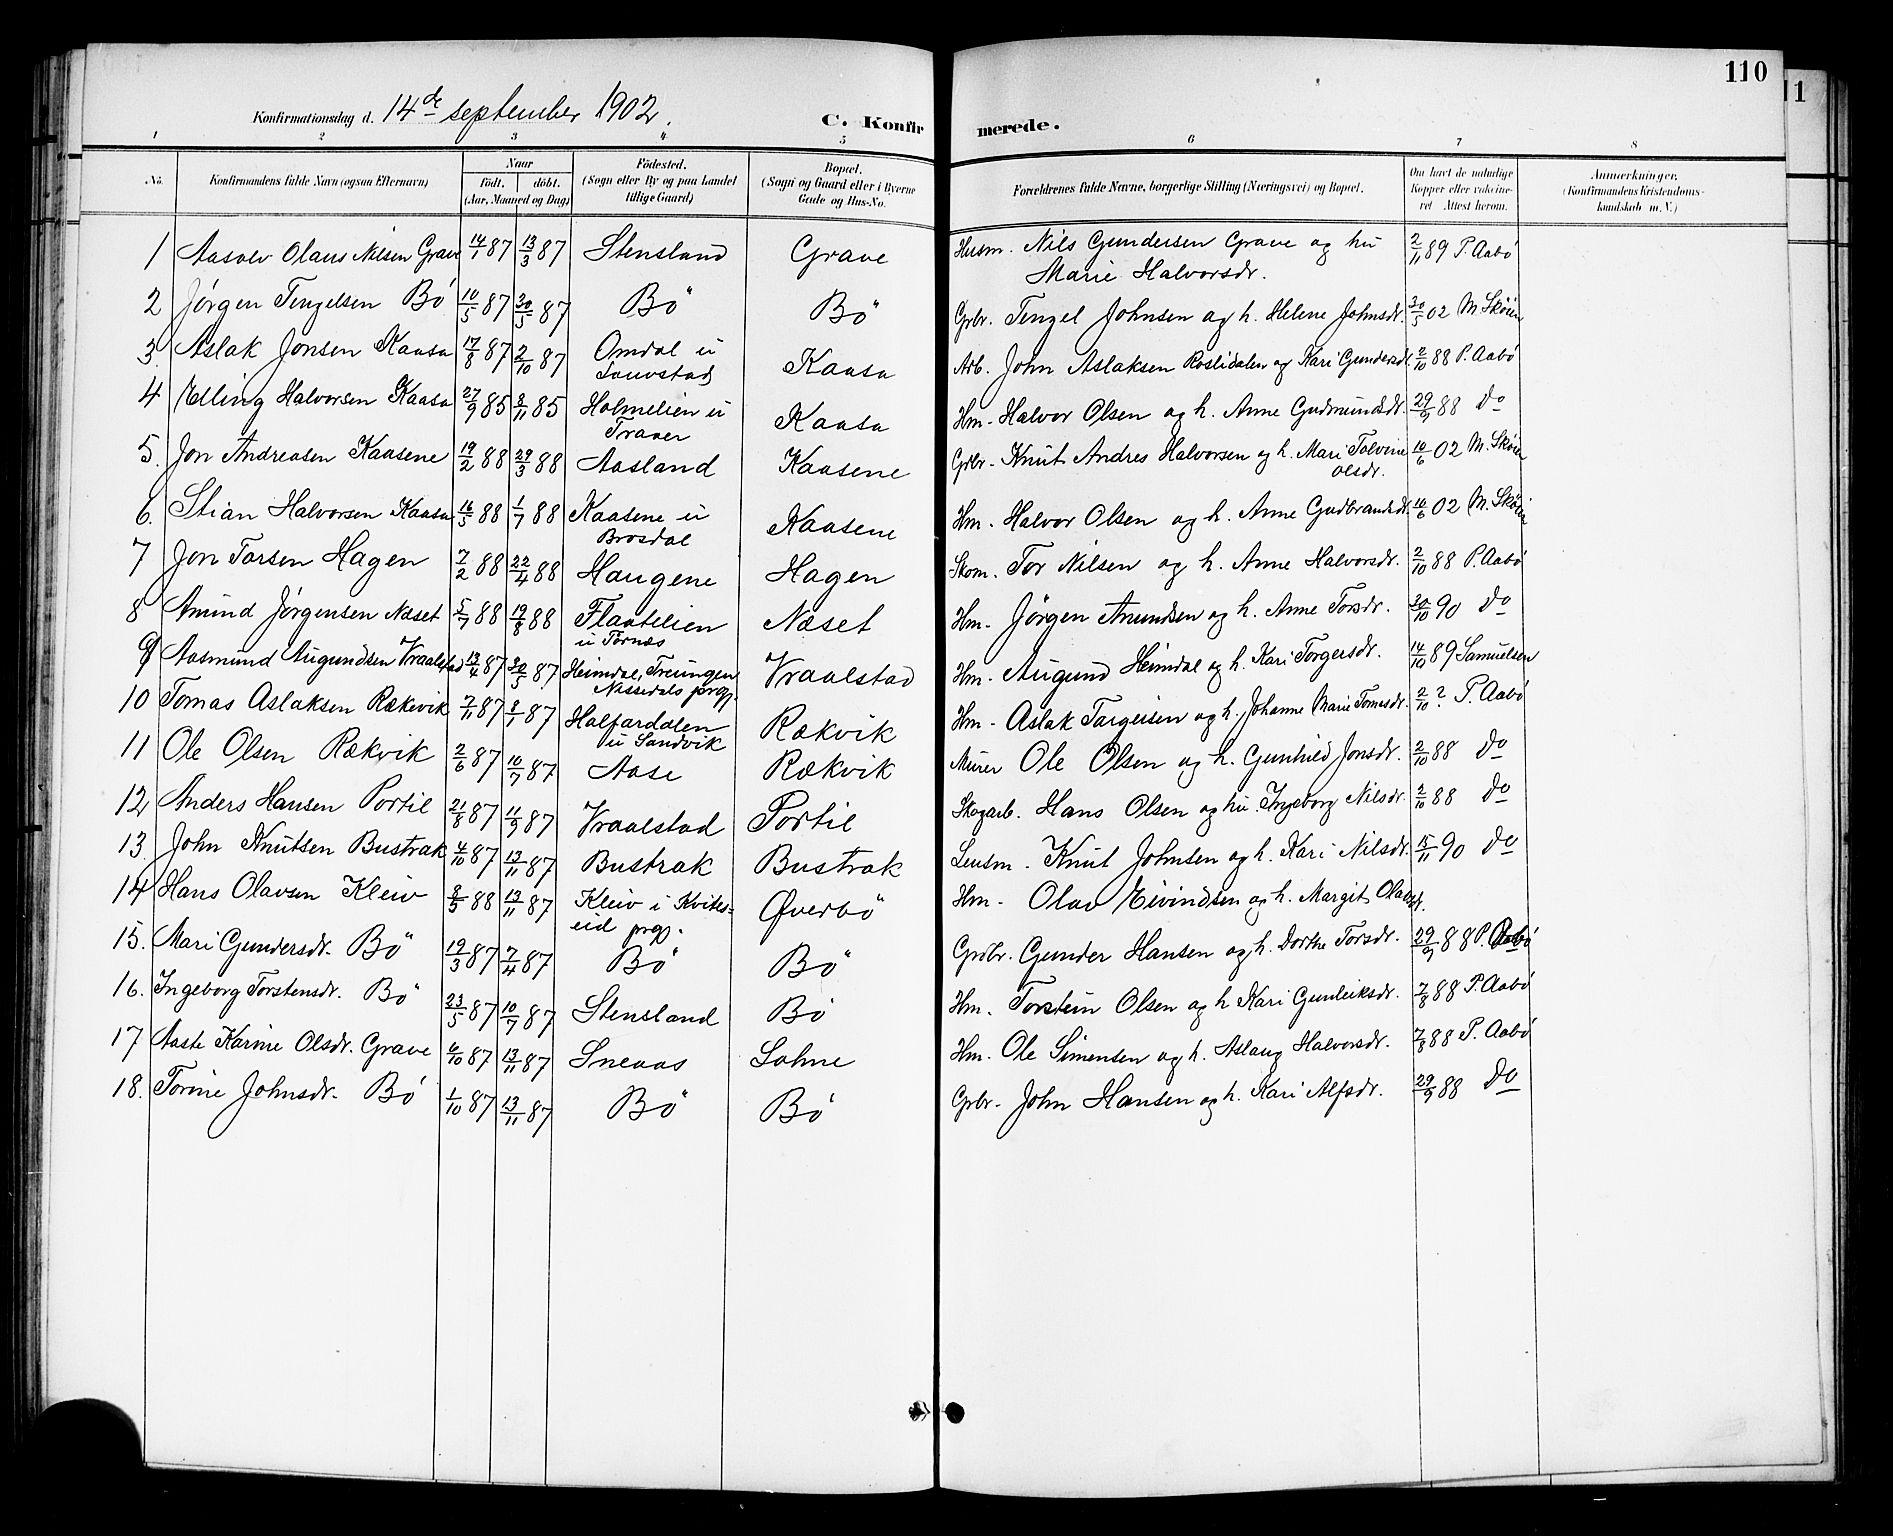 SAKO, Drangedal kirkebøker, G/Gb/L0002: Klokkerbok nr. II 2, 1895-1918, s. 110